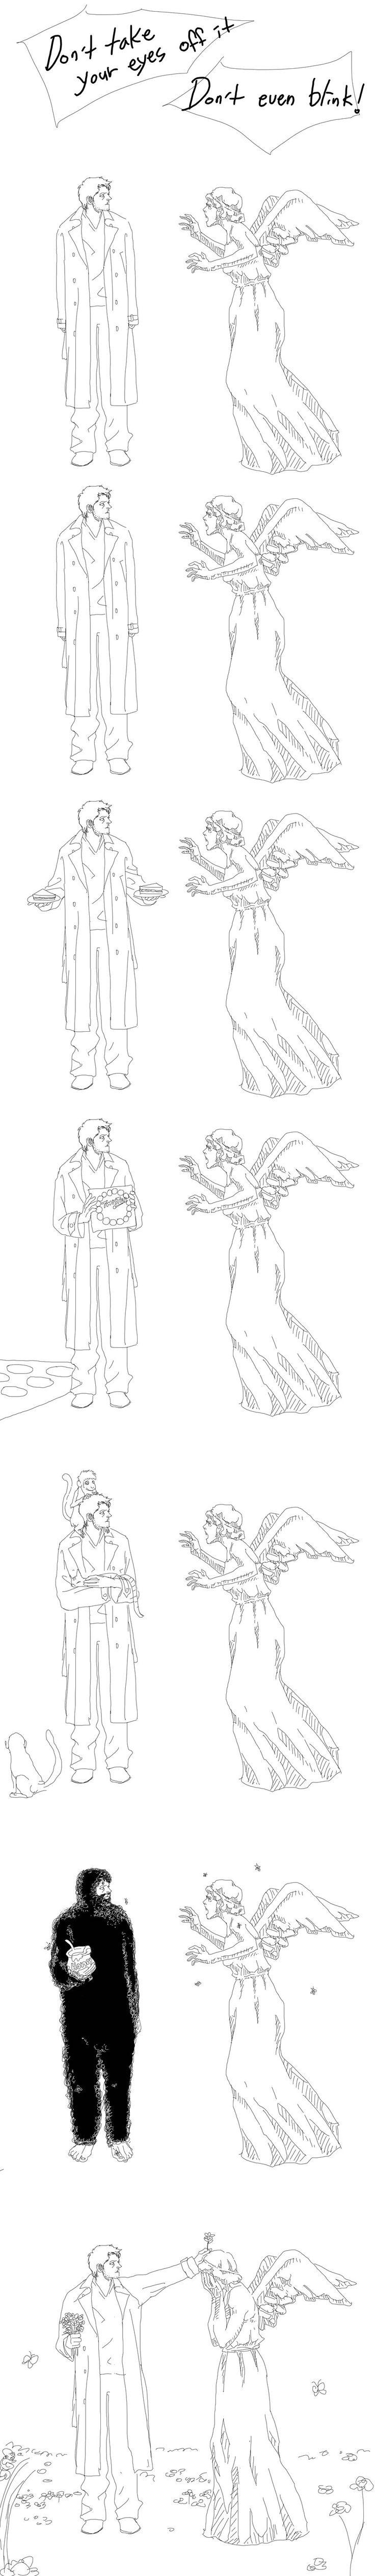 Castiel vs Weeping Angel by sweetdari.deviantart.com on @deviantART